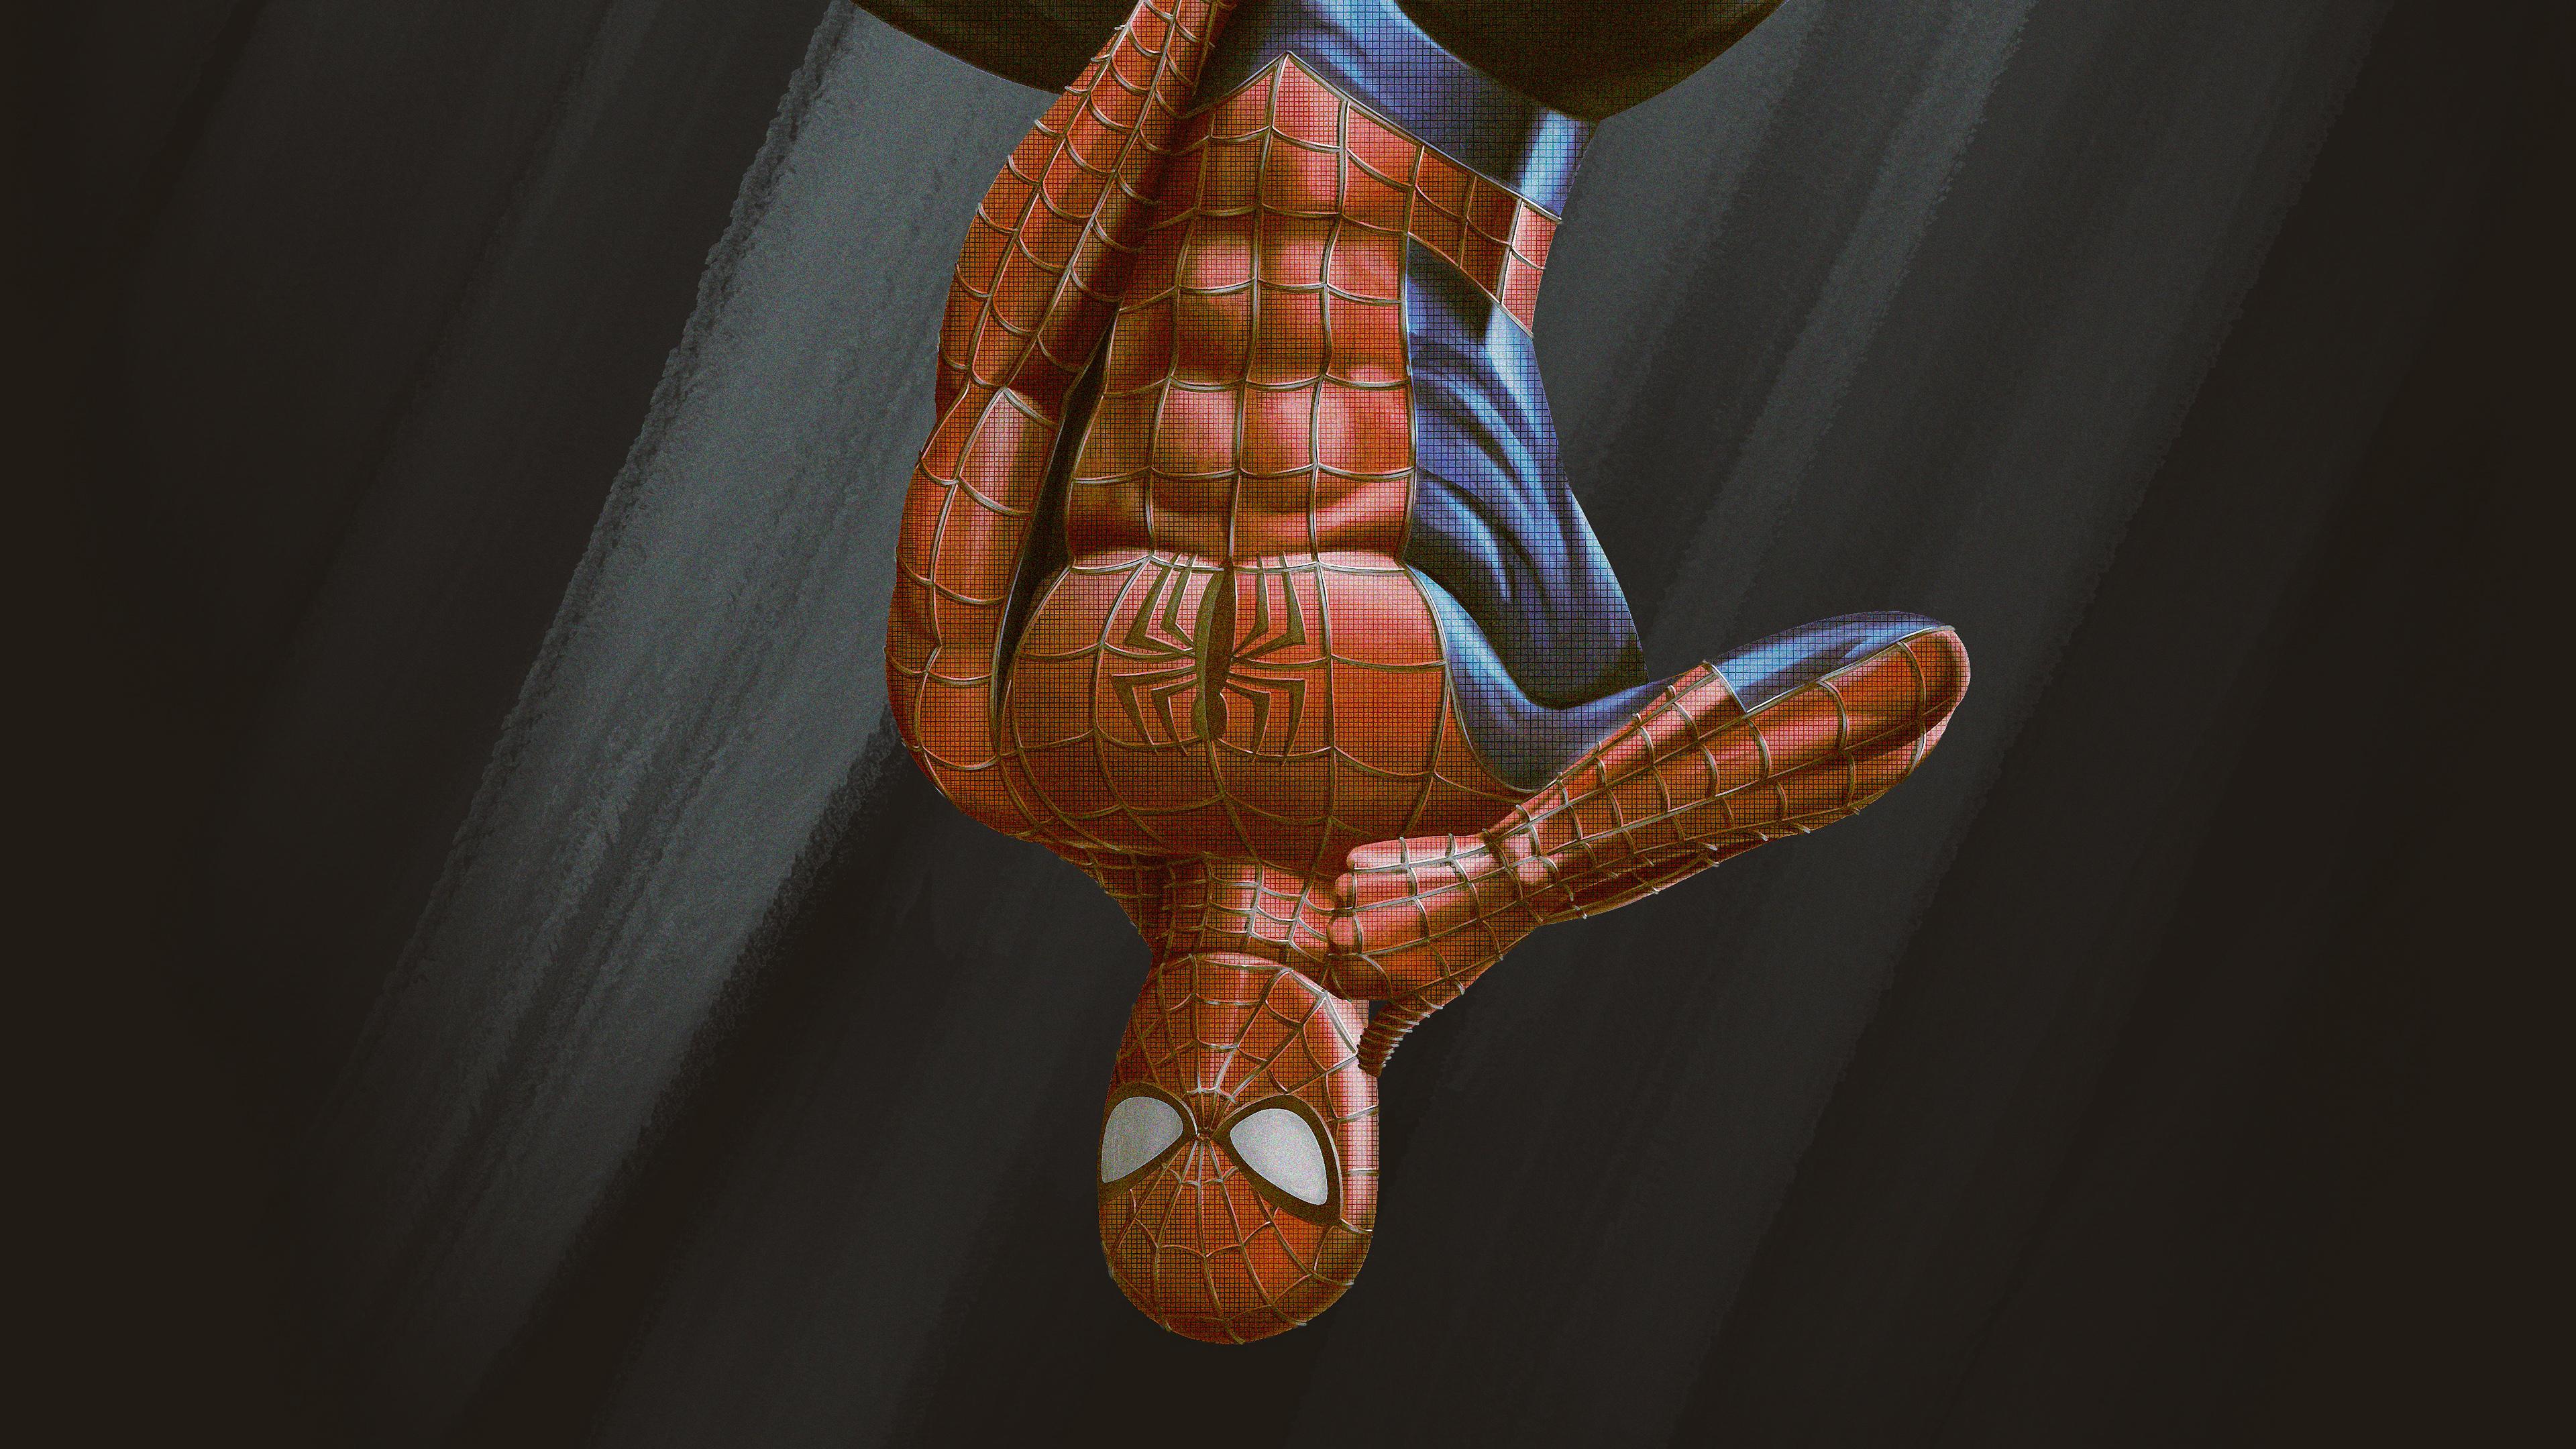 4k art spiderman 1554244976 - 4k Art Spiderman - superheroes wallpapers, spiderman wallpapers, hd-wallpapers, digital art wallpapers, behance wallpapers, artwork wallpapers, art wallpapers, 4k-wallpapers